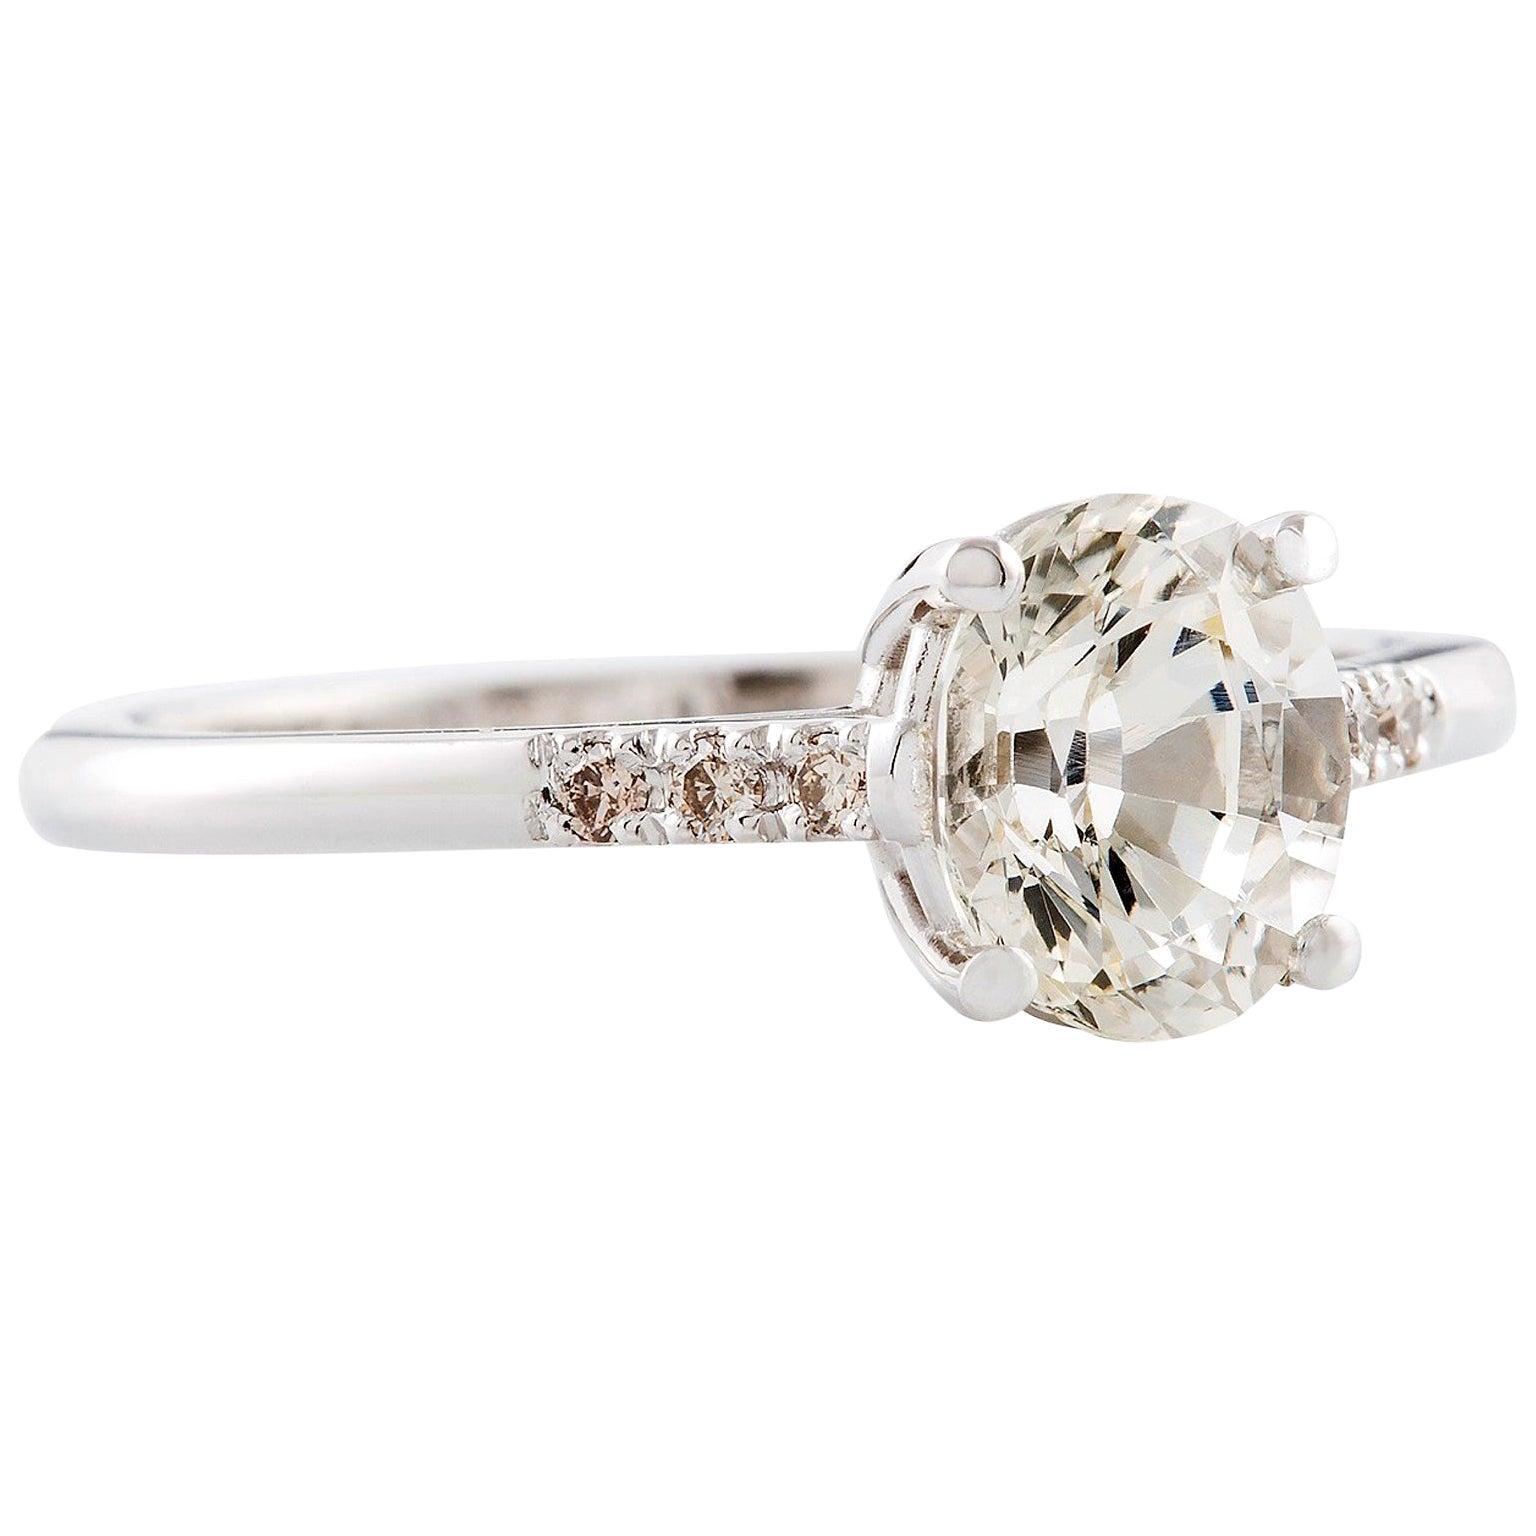 Kian Design 1.54 Carat Oval White Sapphire and Diamond Ring 18 Carat White Gold